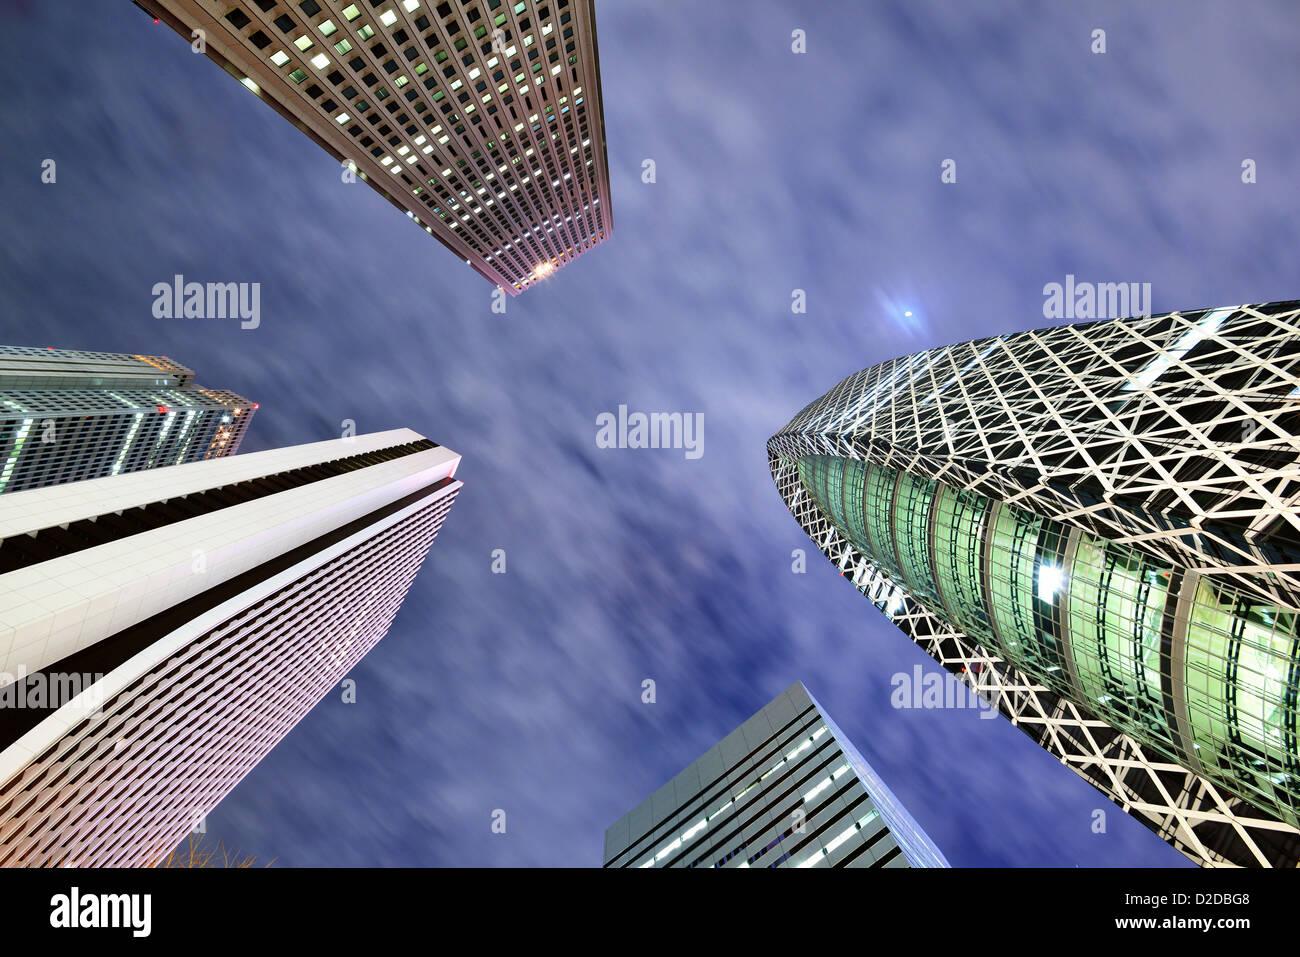 High Rises in Shinjuku Ward, Tokyo, Japan. - Stock Image